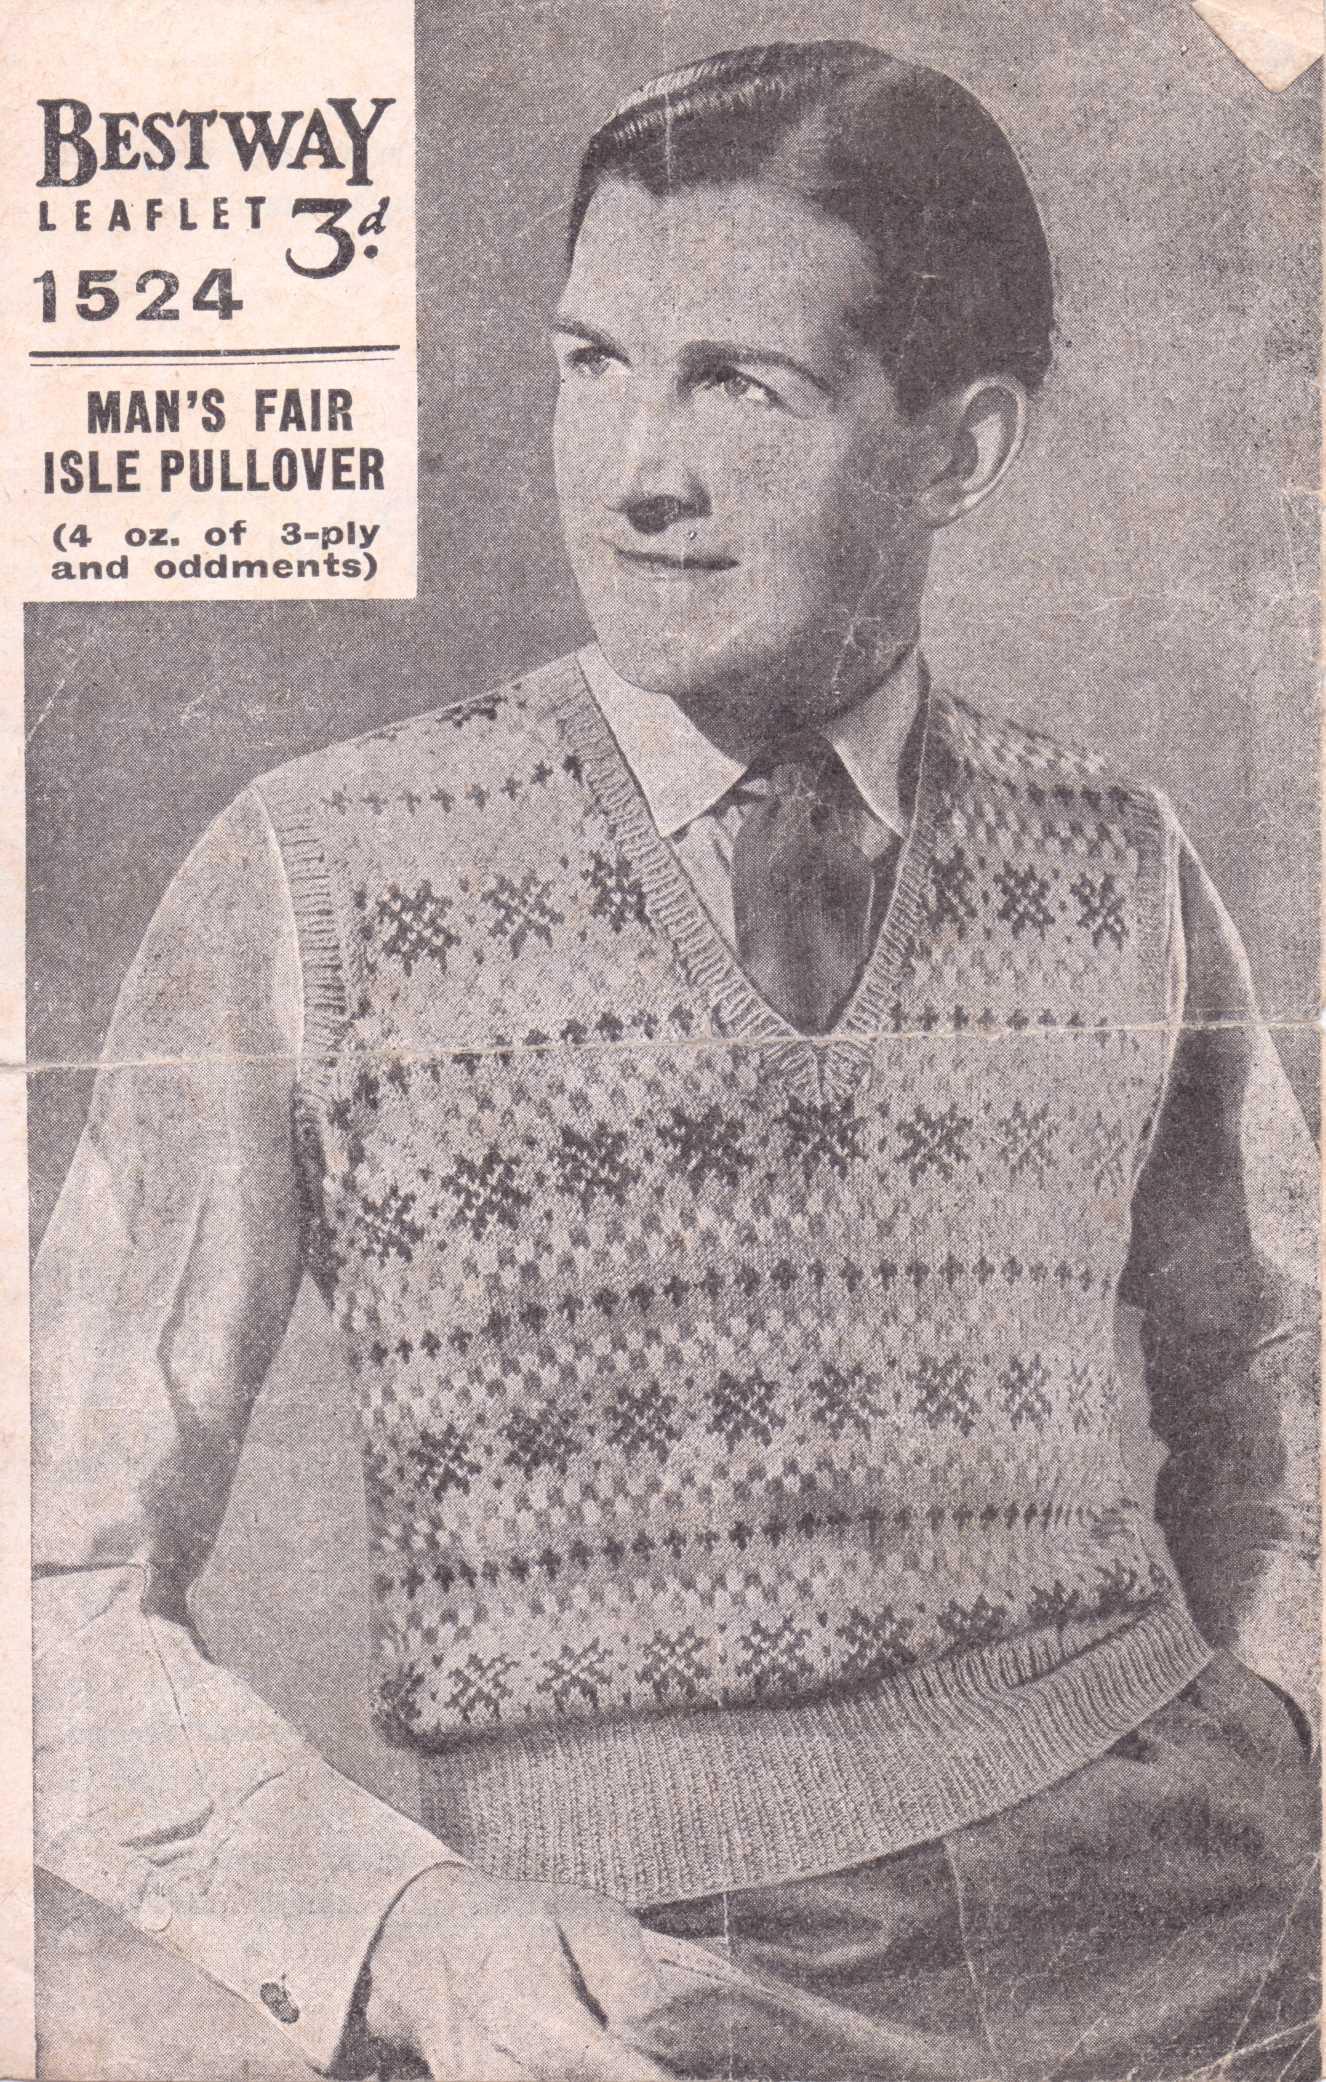 df659a628 ... Fair Isle Pullover Bestway Leaflet 1524. Bestway 1524 free knitting  pattern men s